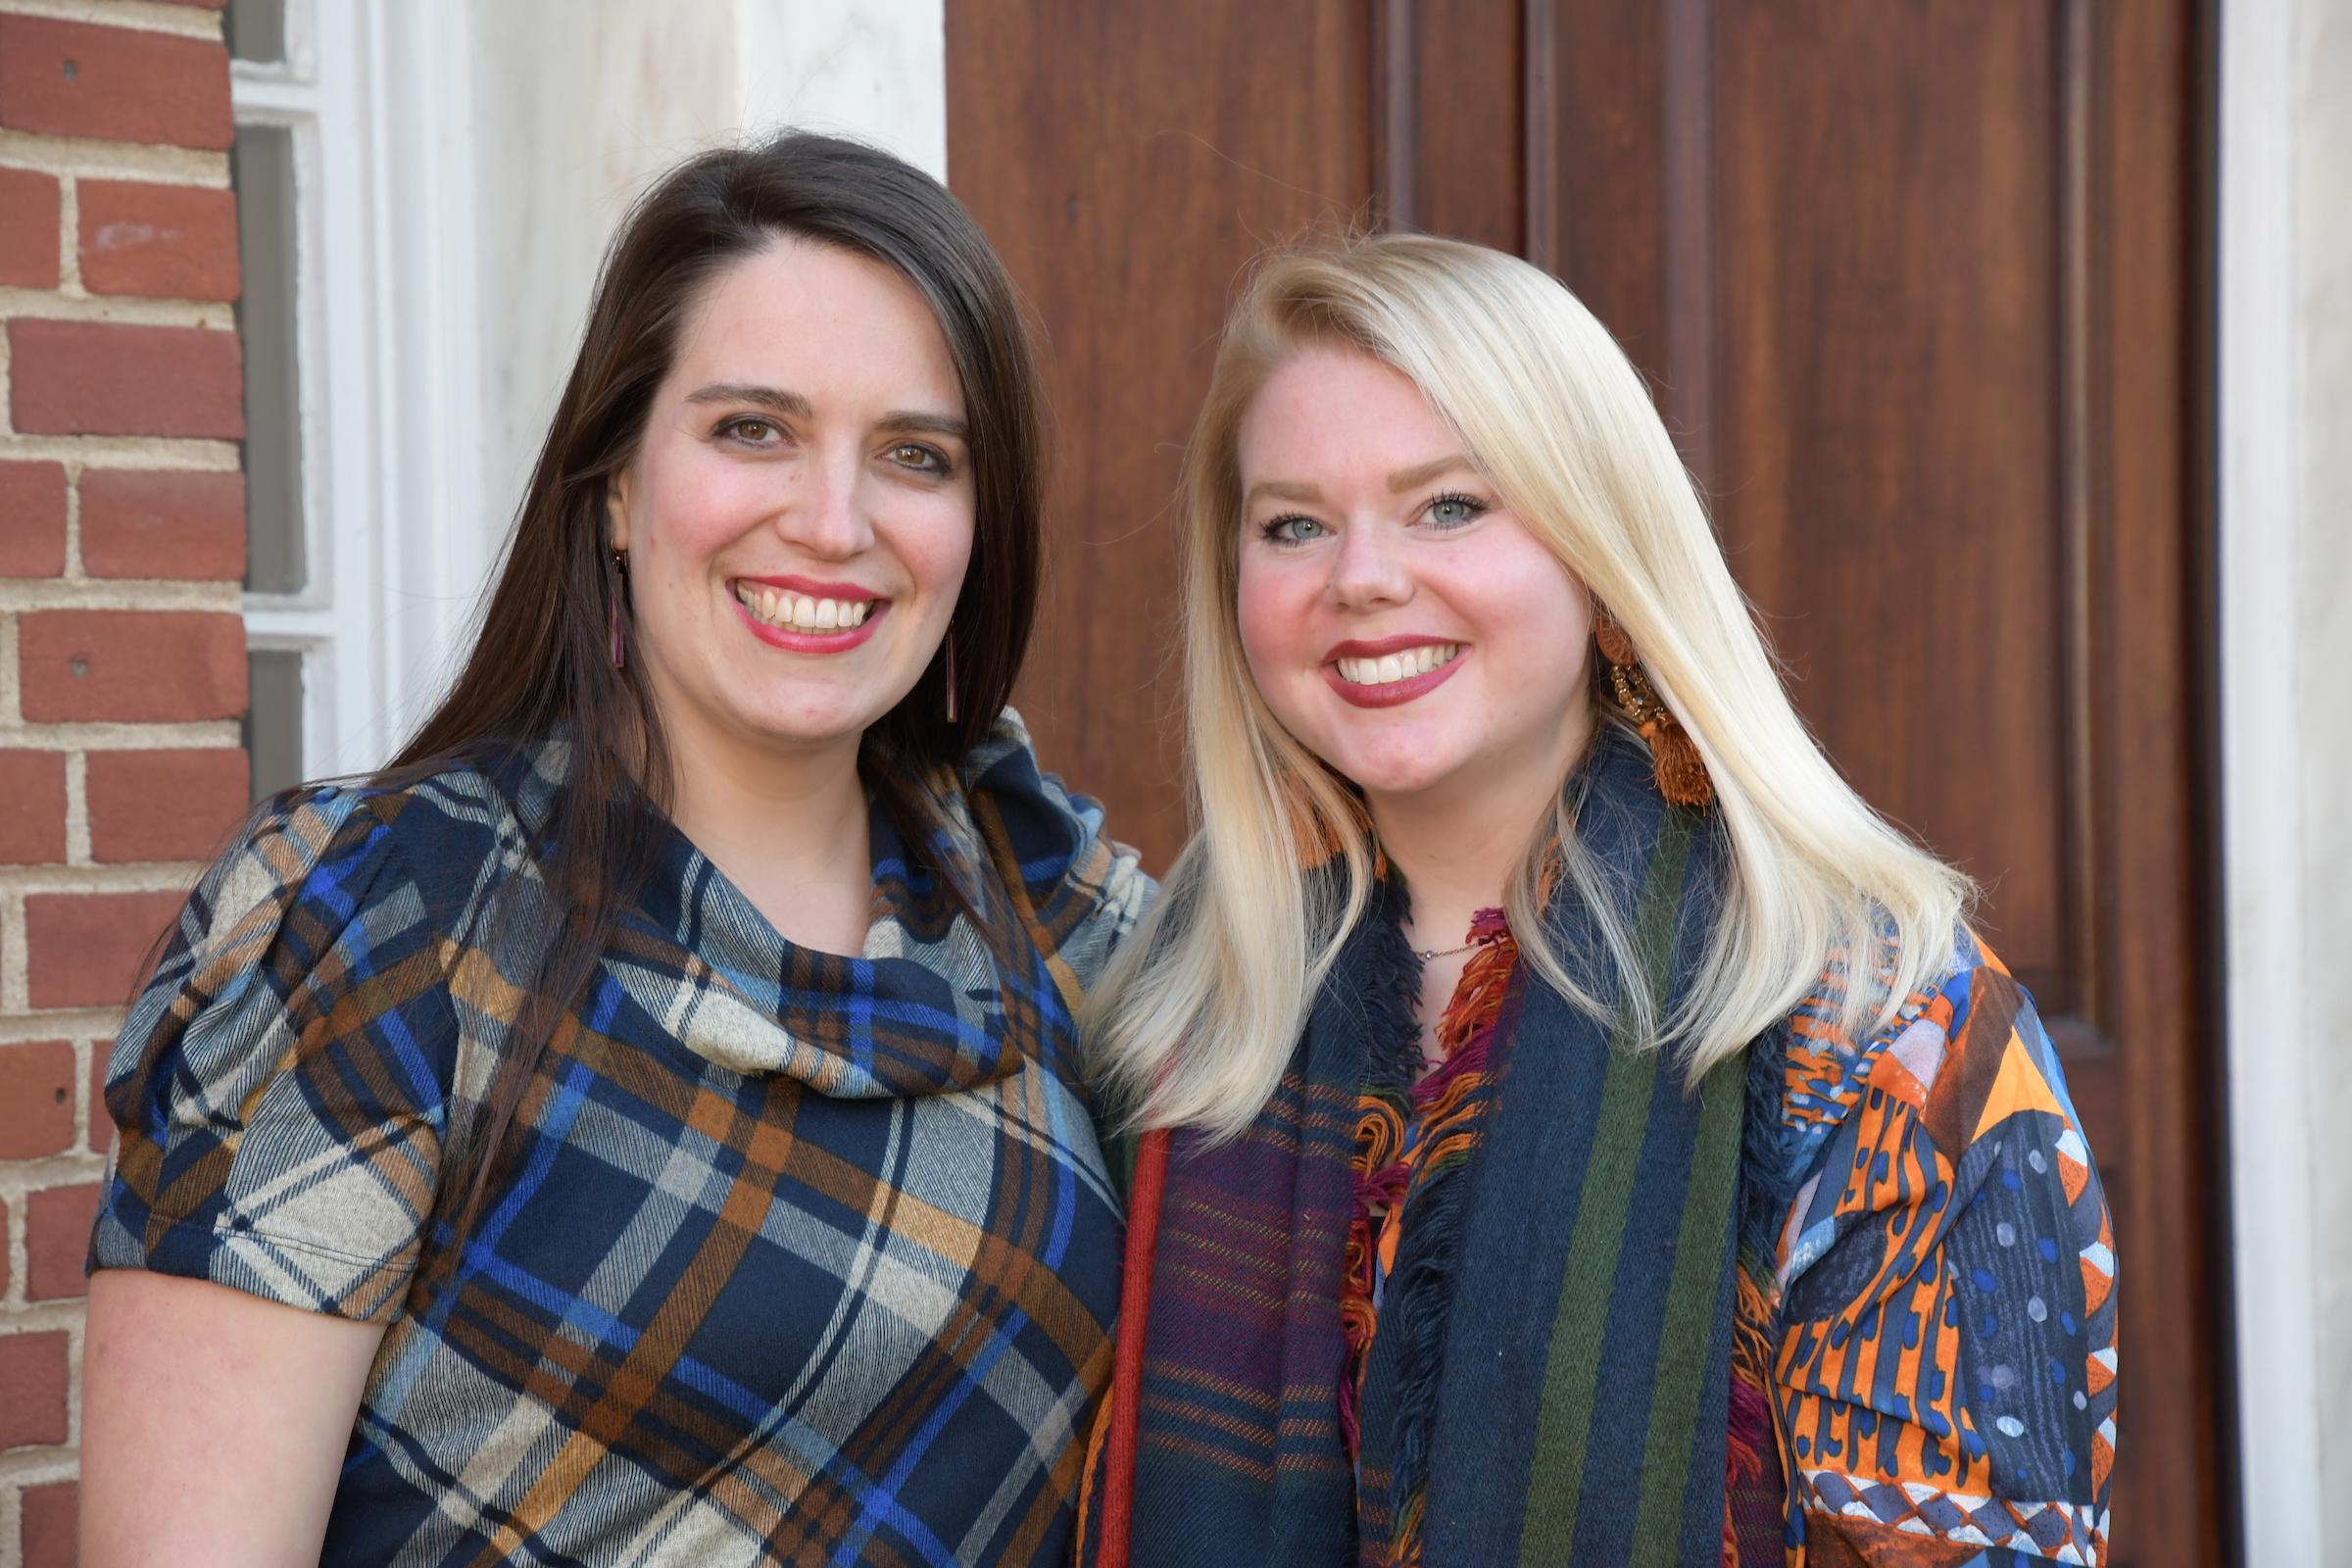 Emily Tiberi and Meghan Blackwood support the arts